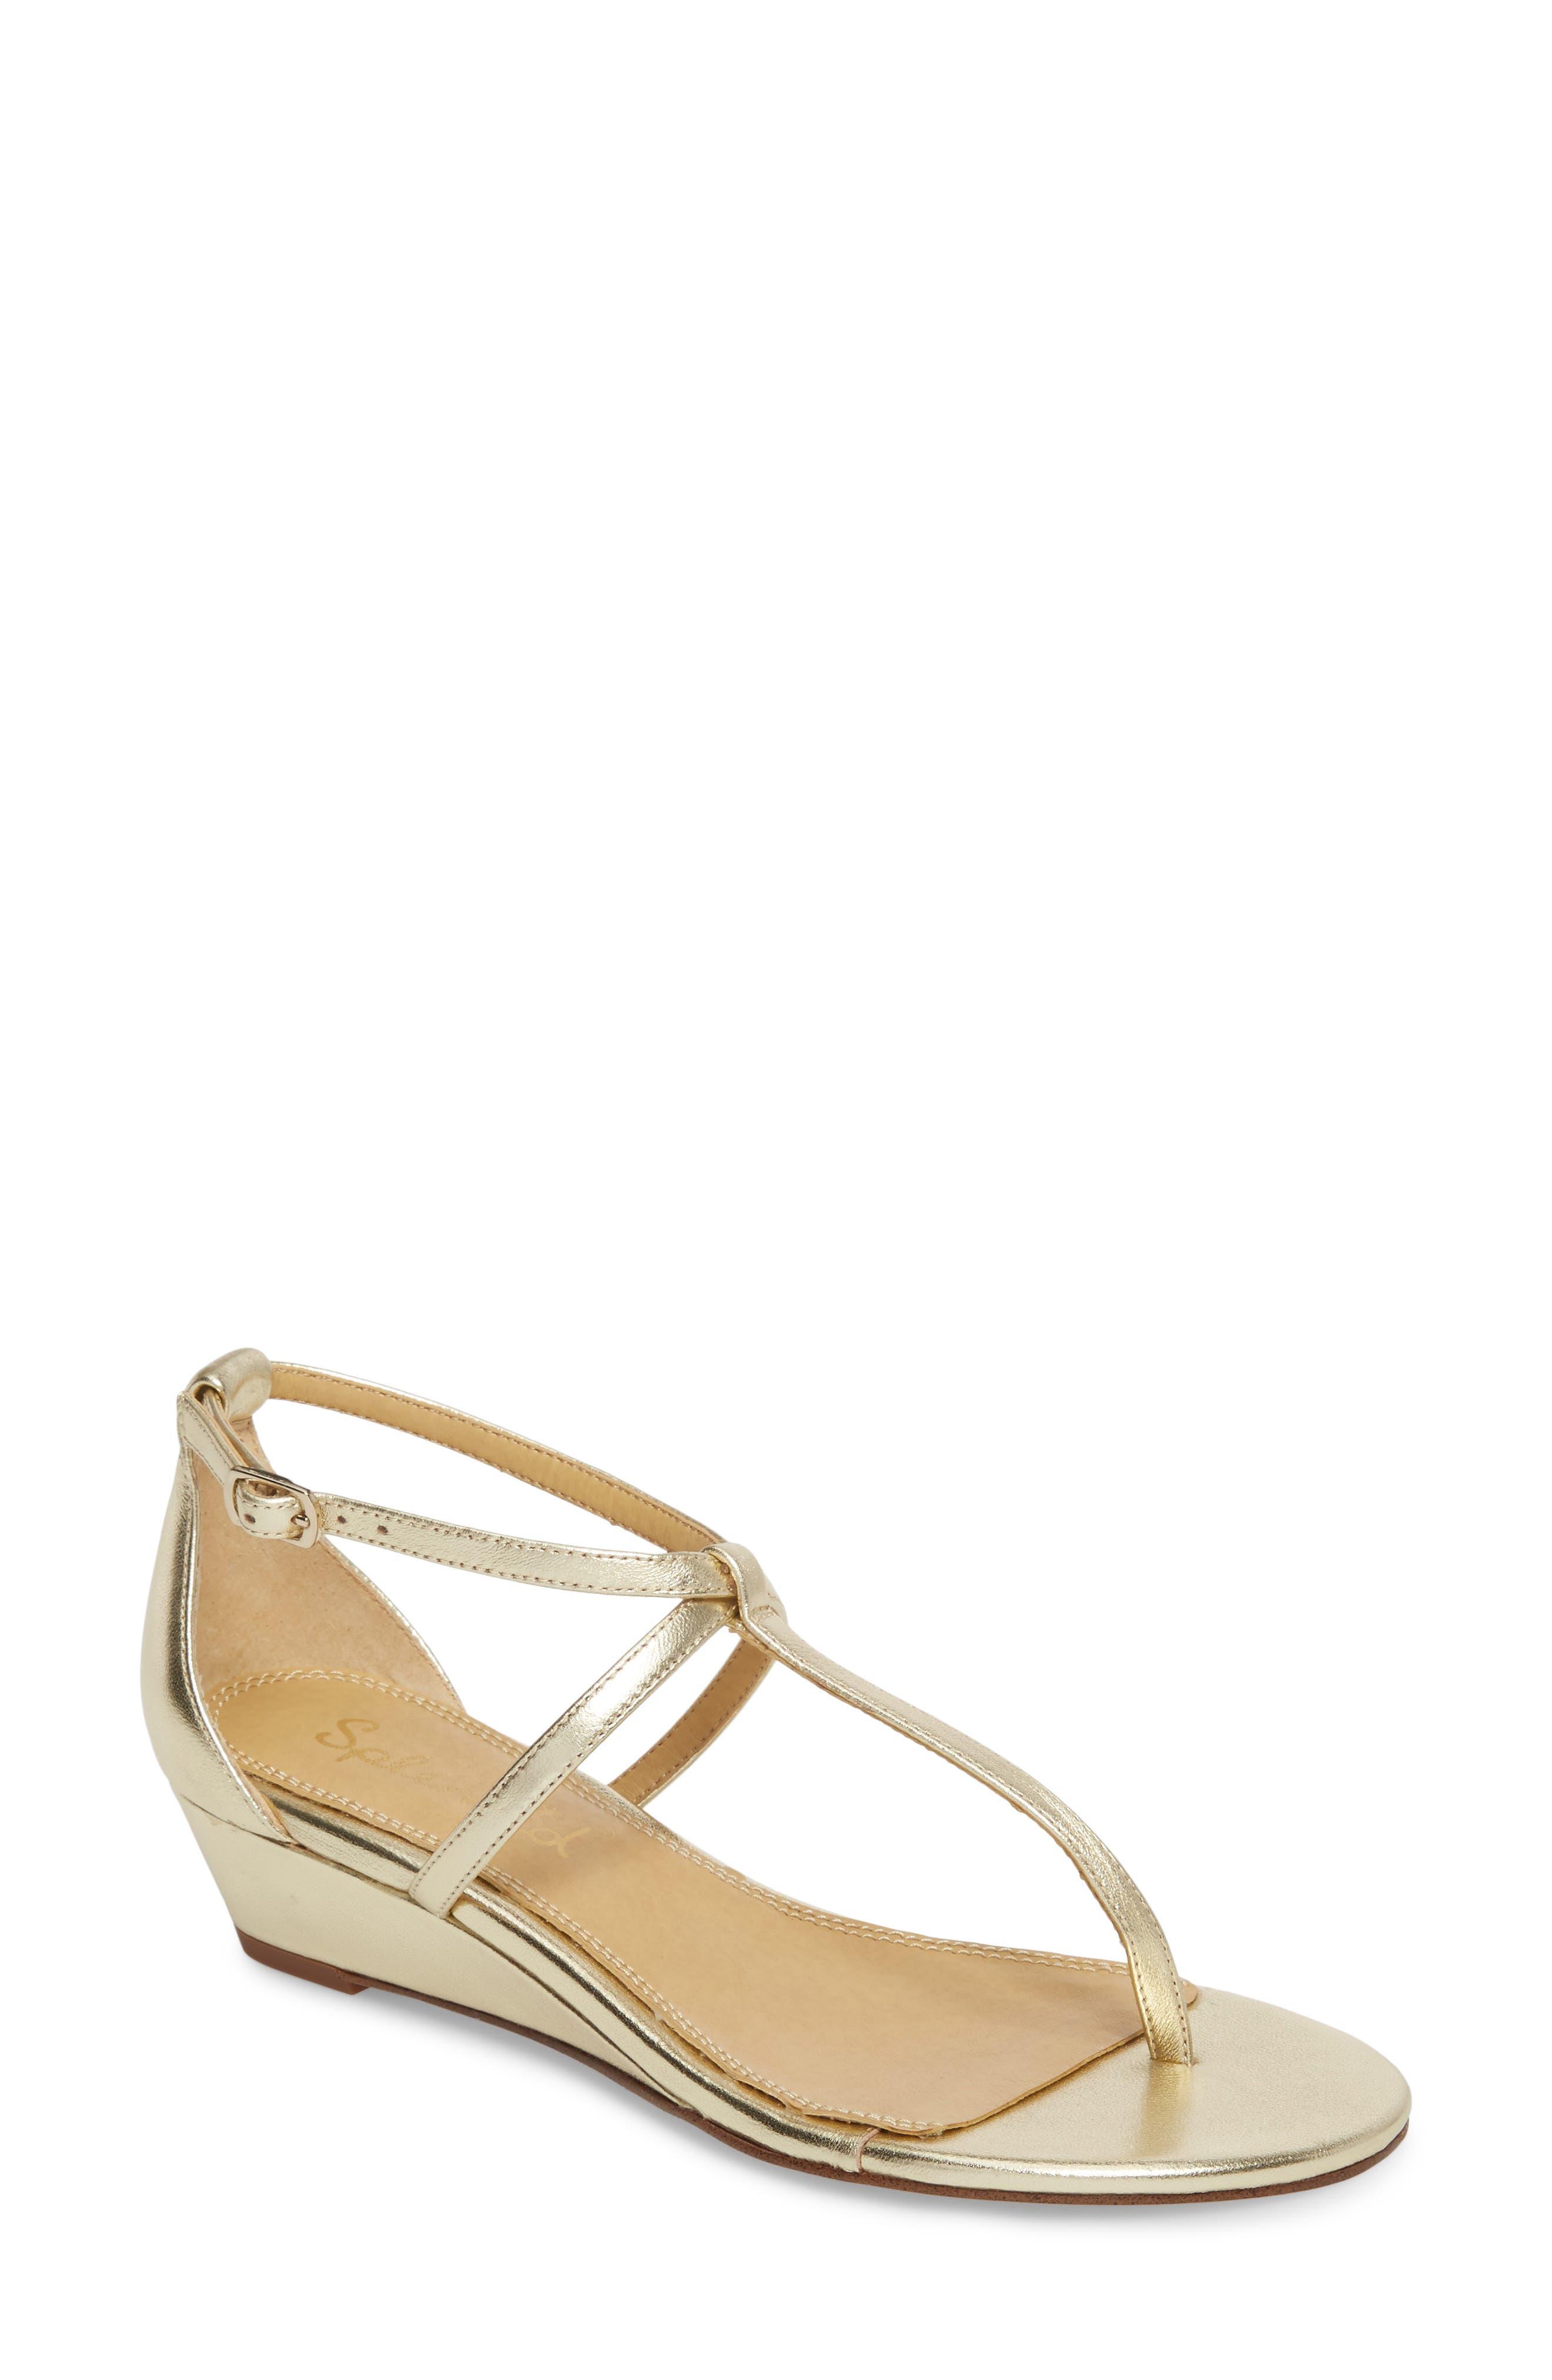 Splendid Bryce T-Strap Wedge Sandal, Metallic